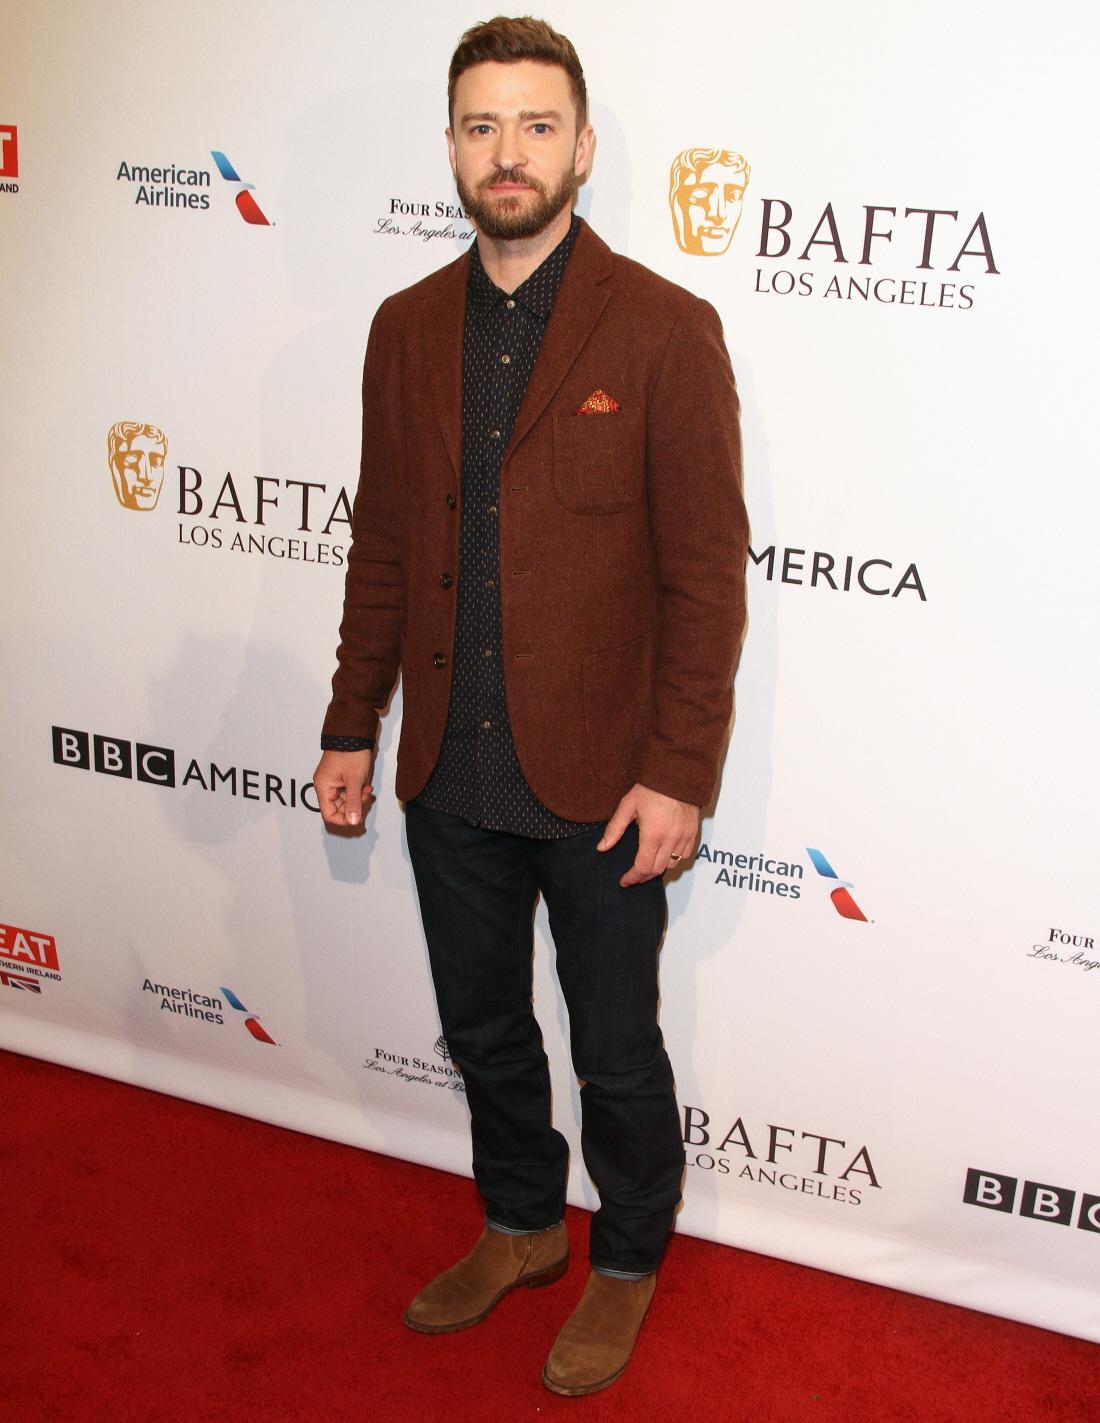 FFN_RIJ_BAFTA_TEA_010717_52275607  bitchy | 2017 Golden Globes Open Submit: hosted by Justin Timberlake's unstoppable emotions FFN RIJ BAFTA TEA 010717 52275607